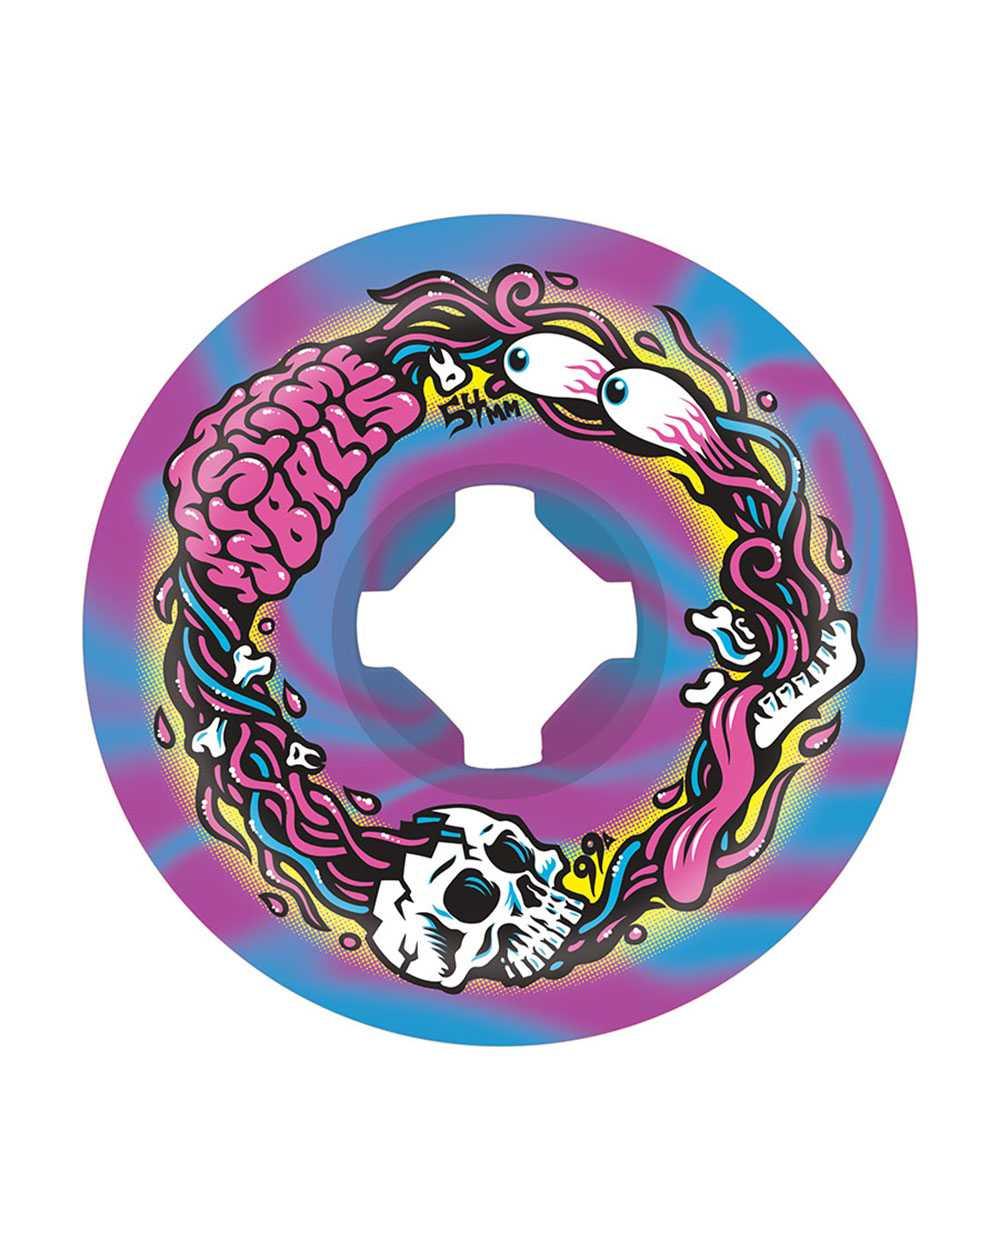 Slime Balls Ruote Skateboard Brains Speed Balls 54mm 99A 4 pz